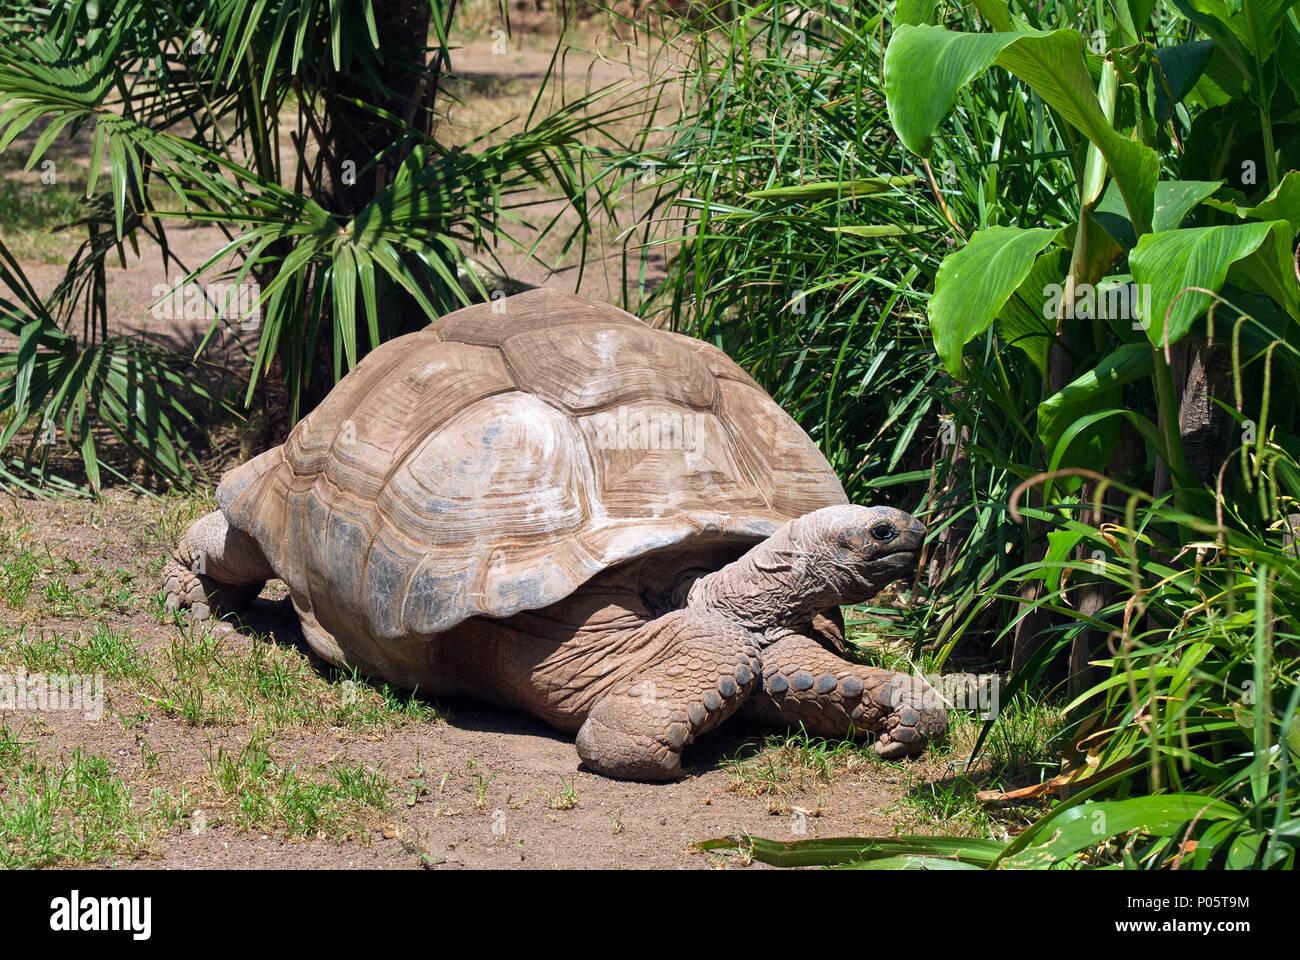 Aldabra giant tortoise (Aldabrachelys gigantea), Bioparco, Rome, Lazio, Italy - Stock Image